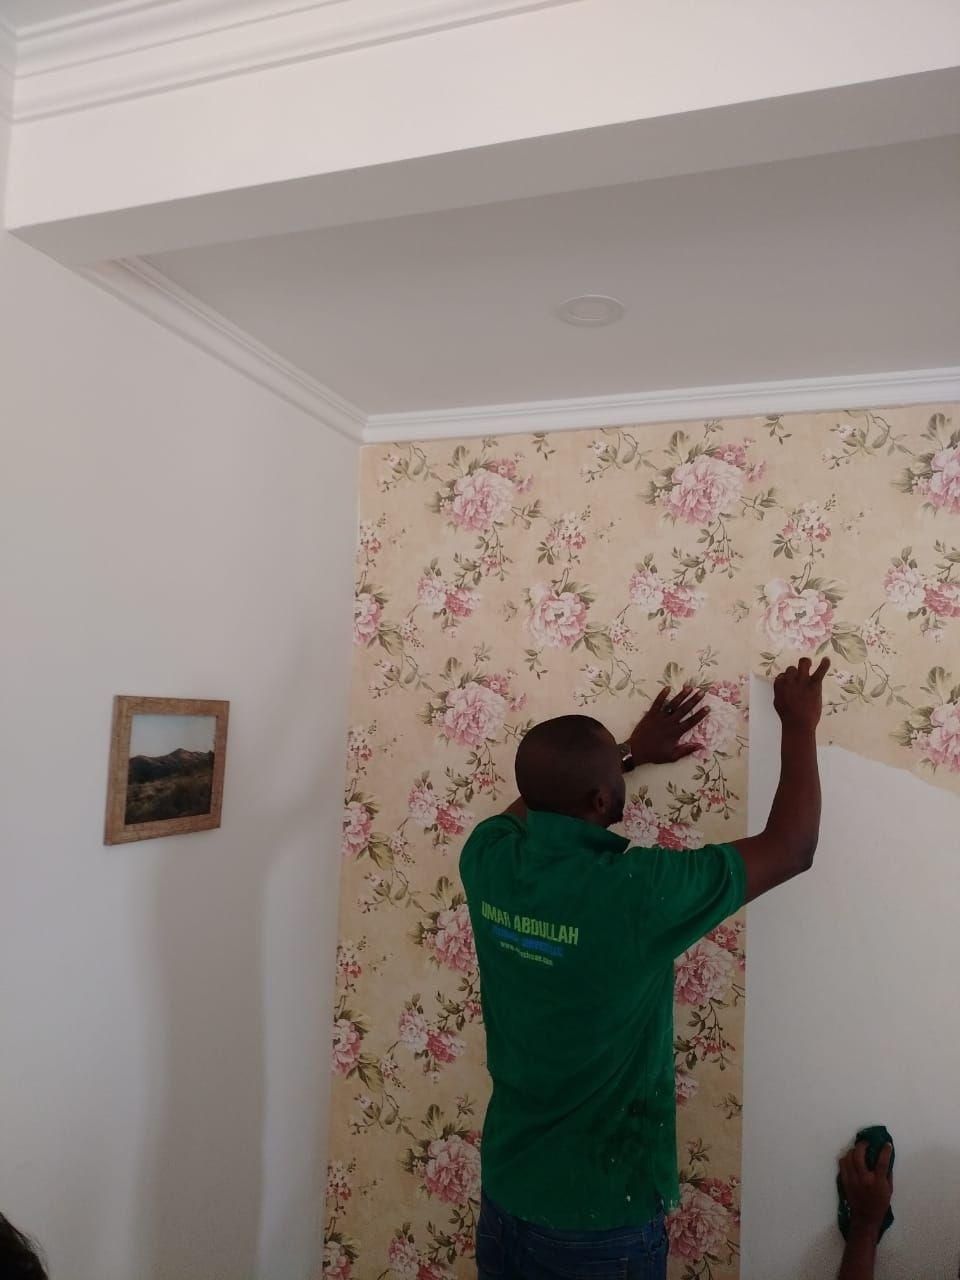 Wallpaper Removal Services In Dubai Removable Wallpaper Wallpaper Removal Services